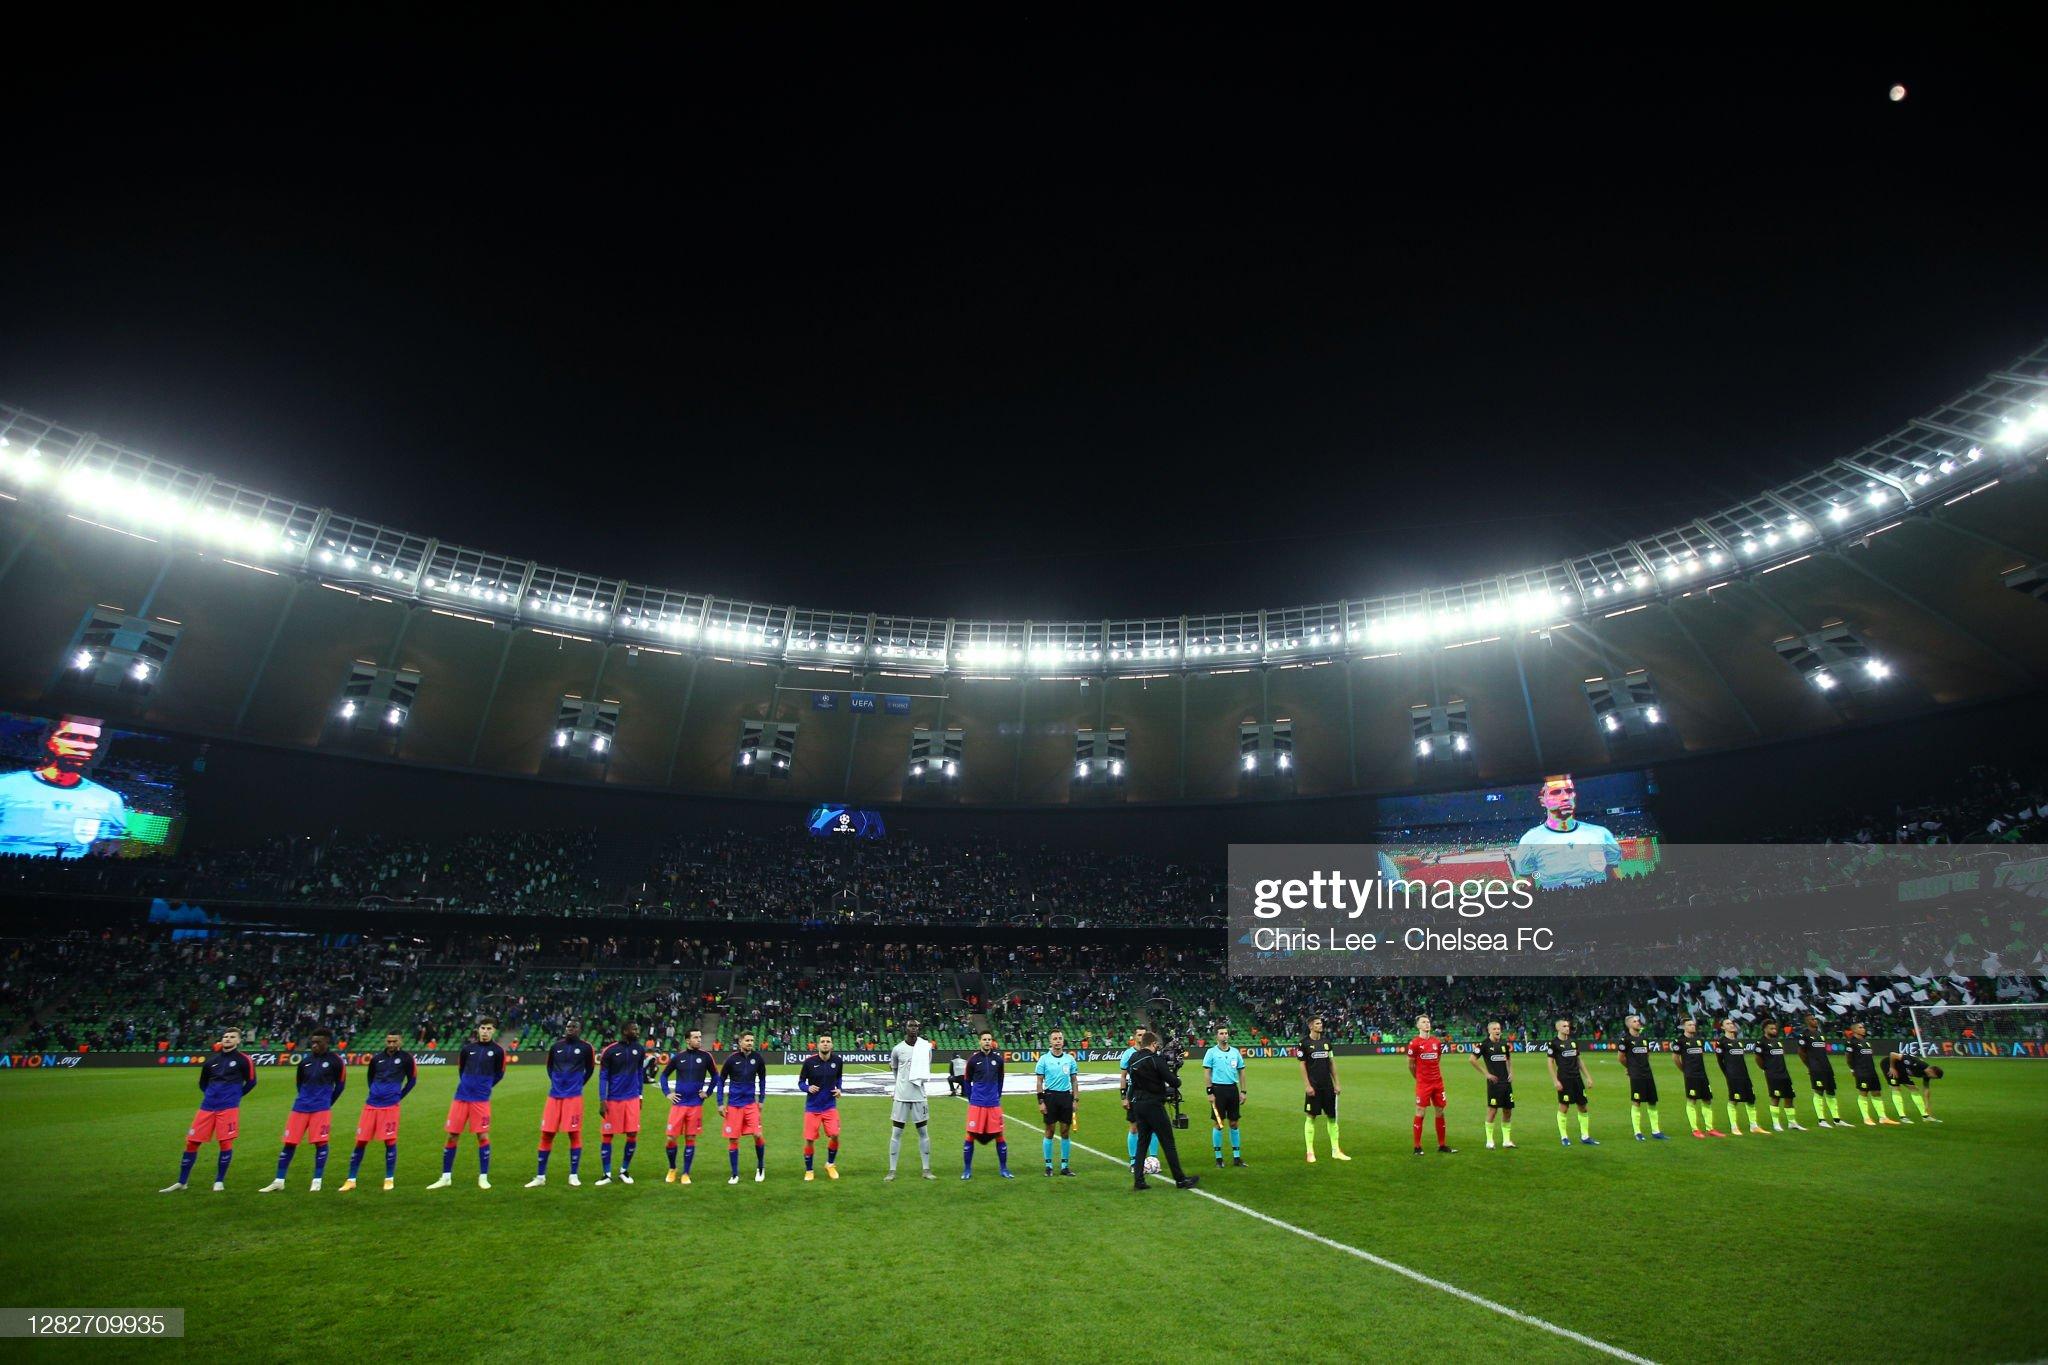 FC Krasnodar v Chelsea FC: Group E - UEFA Champions League : News Photo